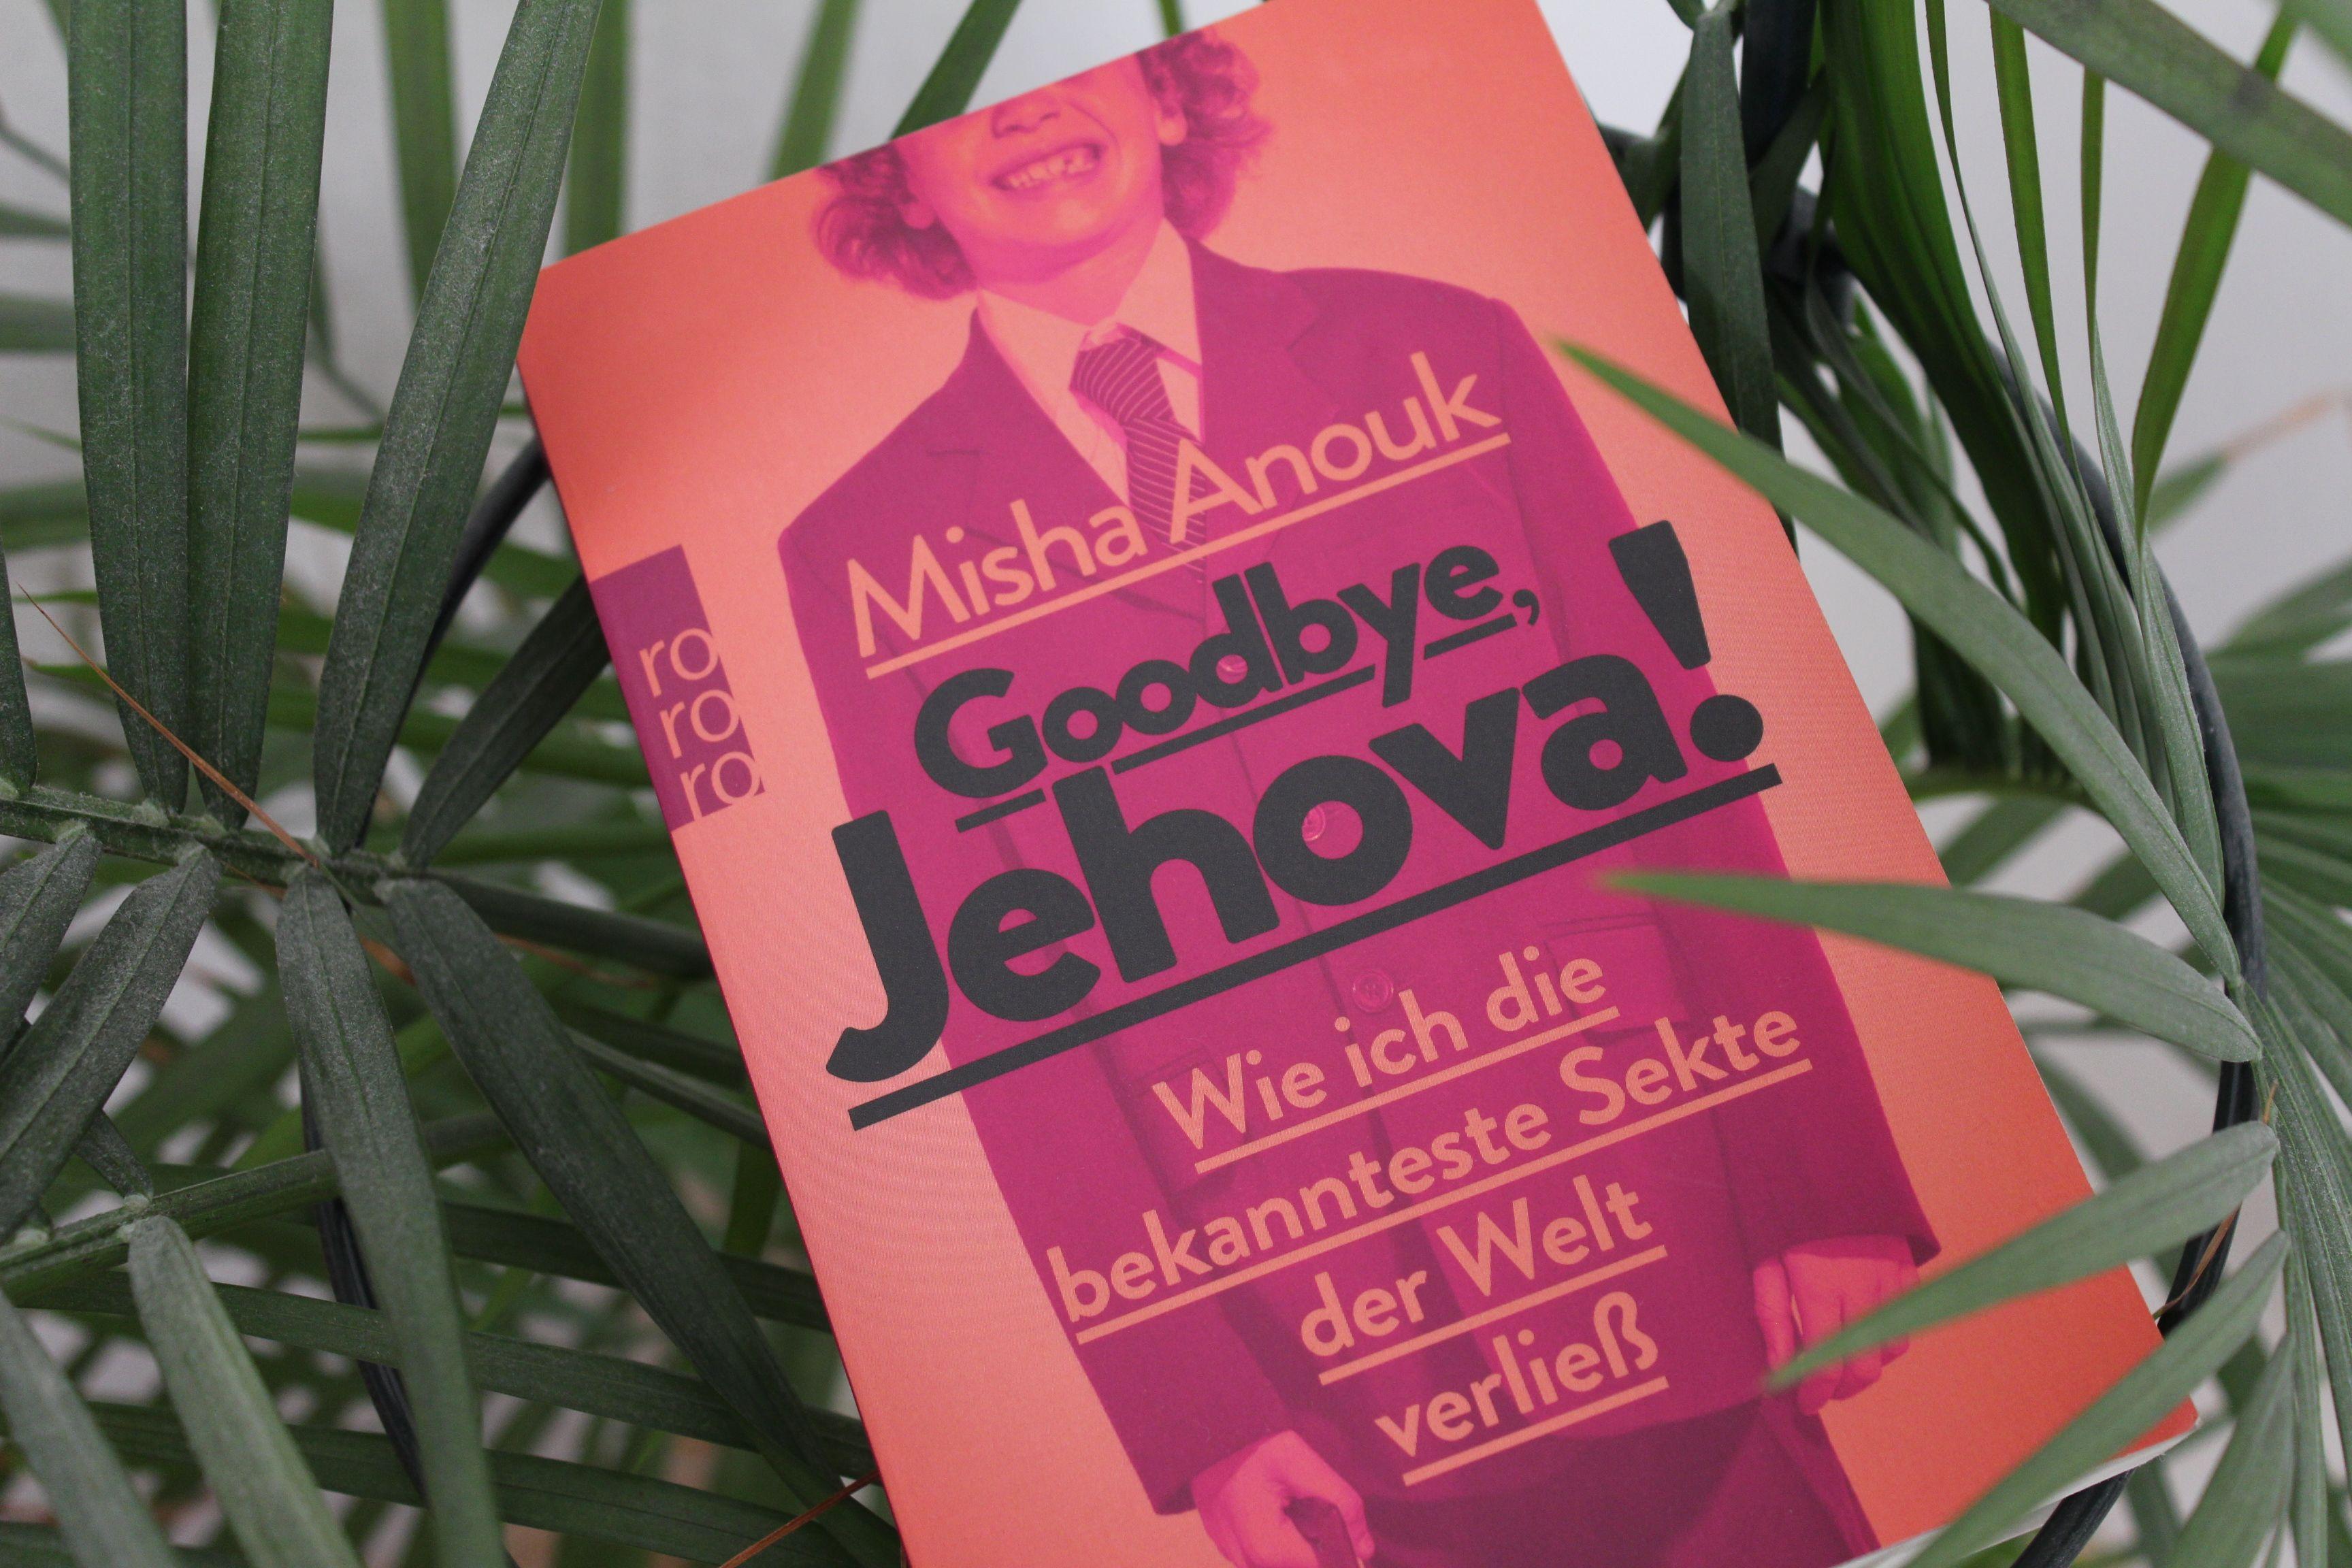 Zeugen Goodbye Jehova Misha Anouk